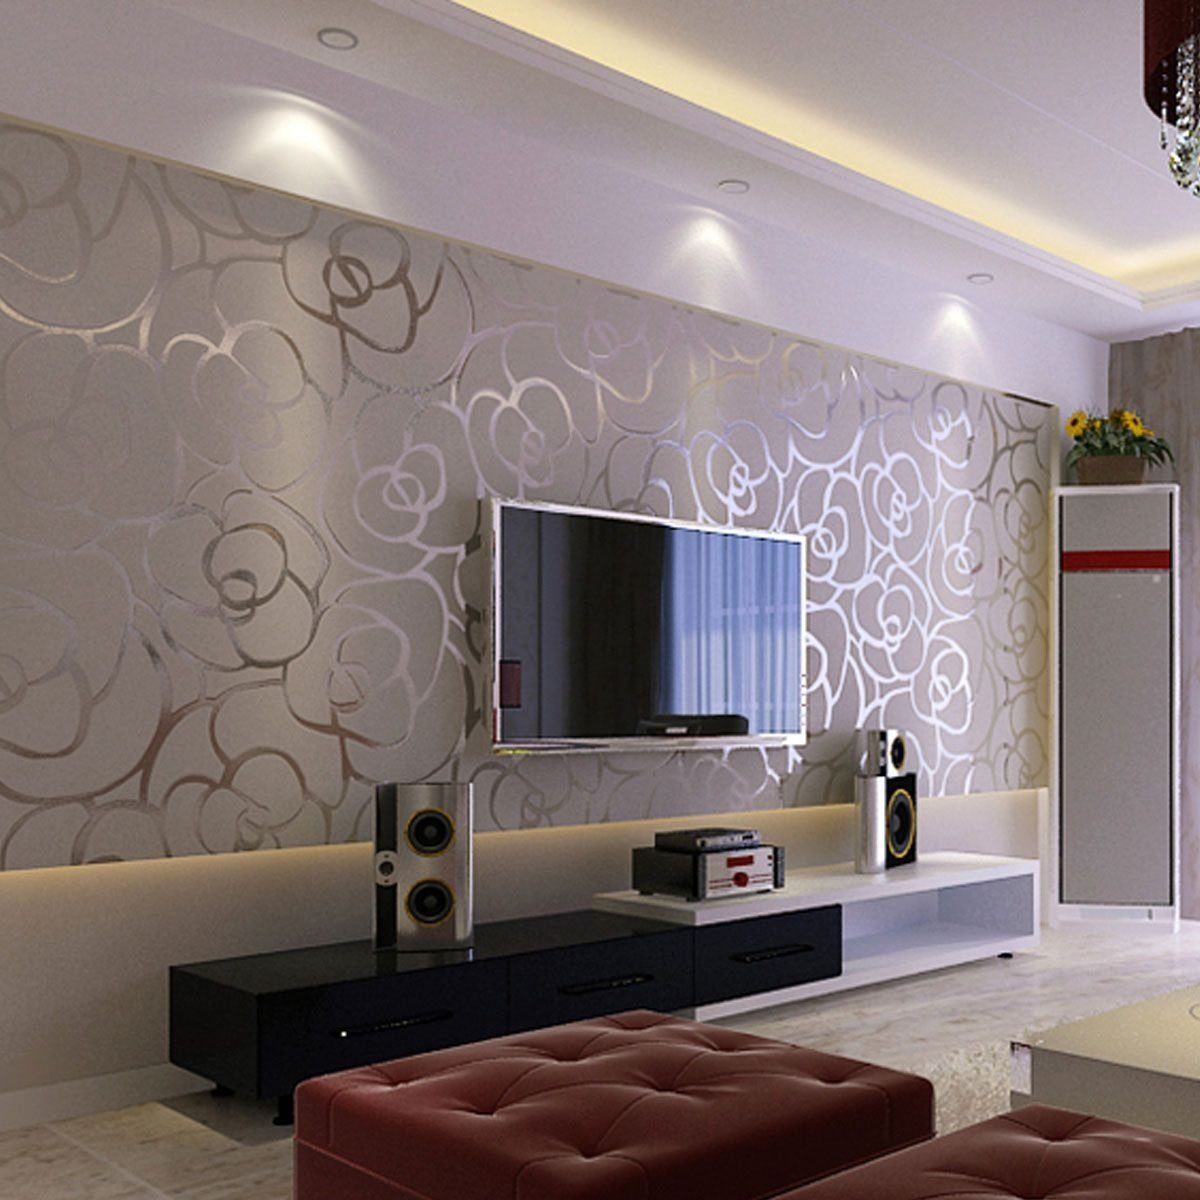 modern wallpaper for walls | full free hd wallpapers | smykowski